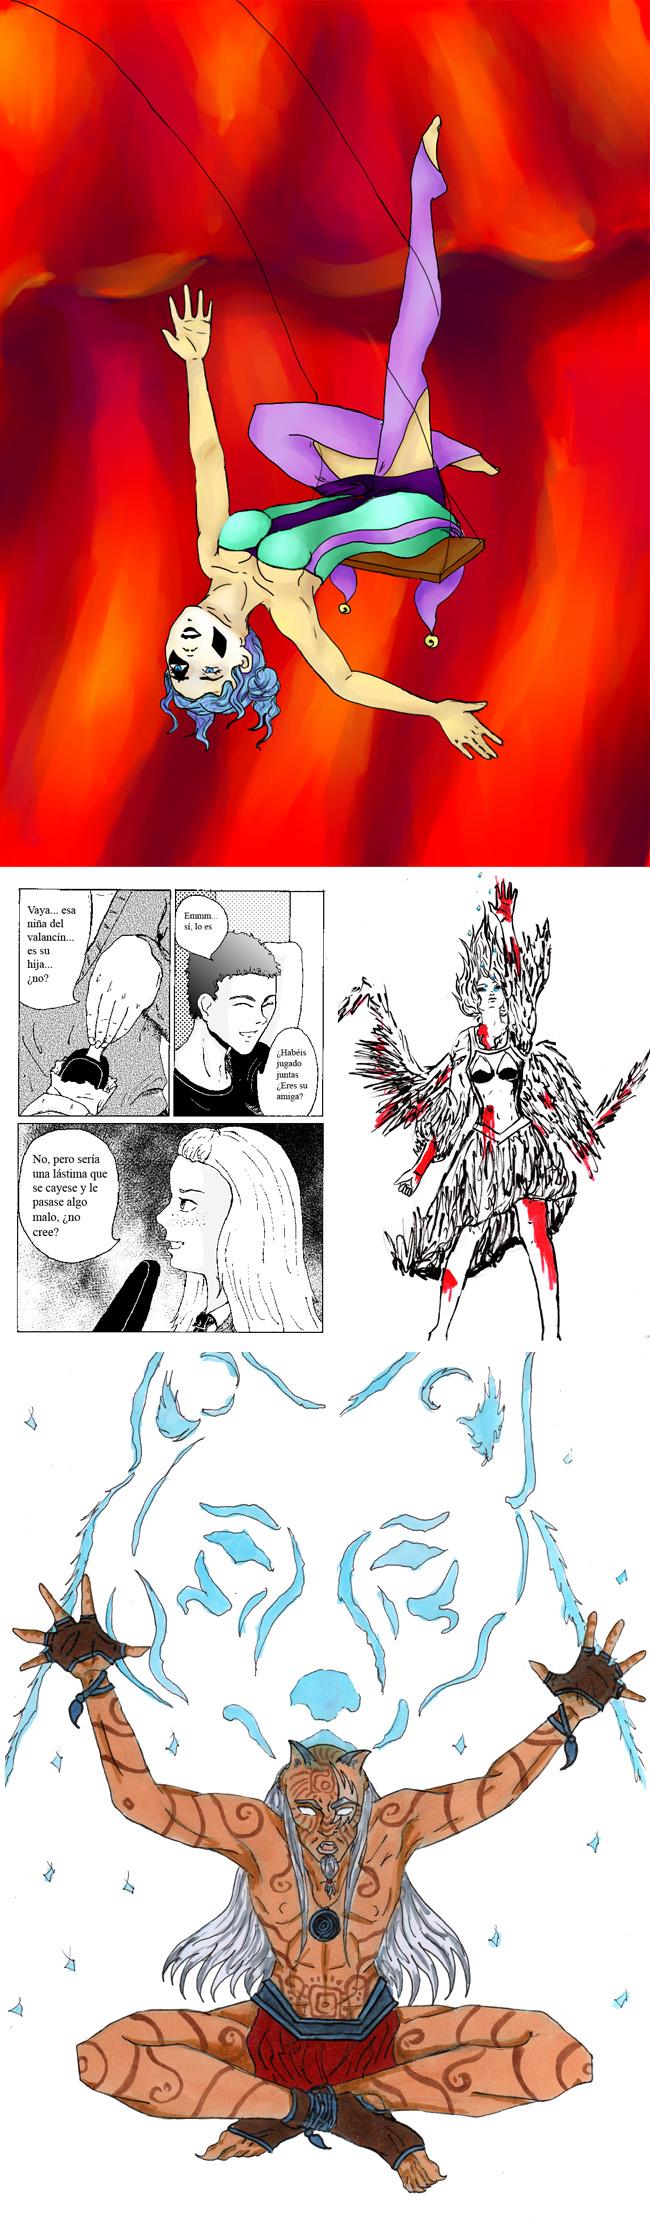 Manga-Aprender-Anime-dibujar-Madrid-AcademiaC10